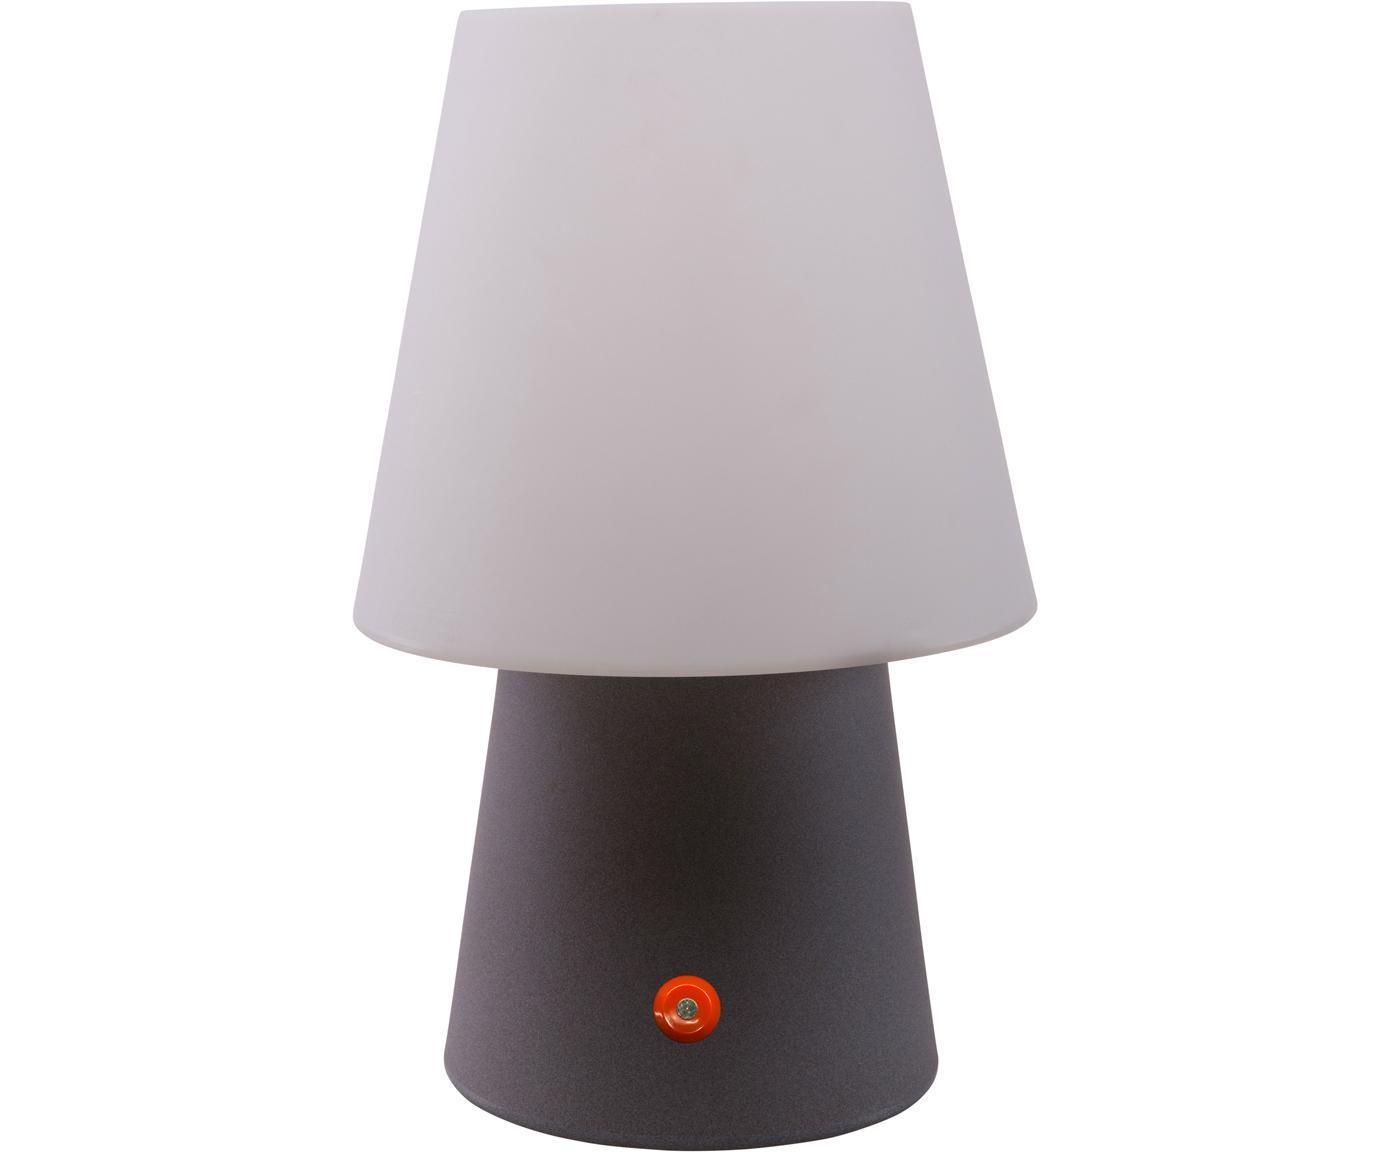 Mobiele outdoor LED tafellamp No. 1 , Kunststof, Wit, taupe, Ø 18 x H 29 cm